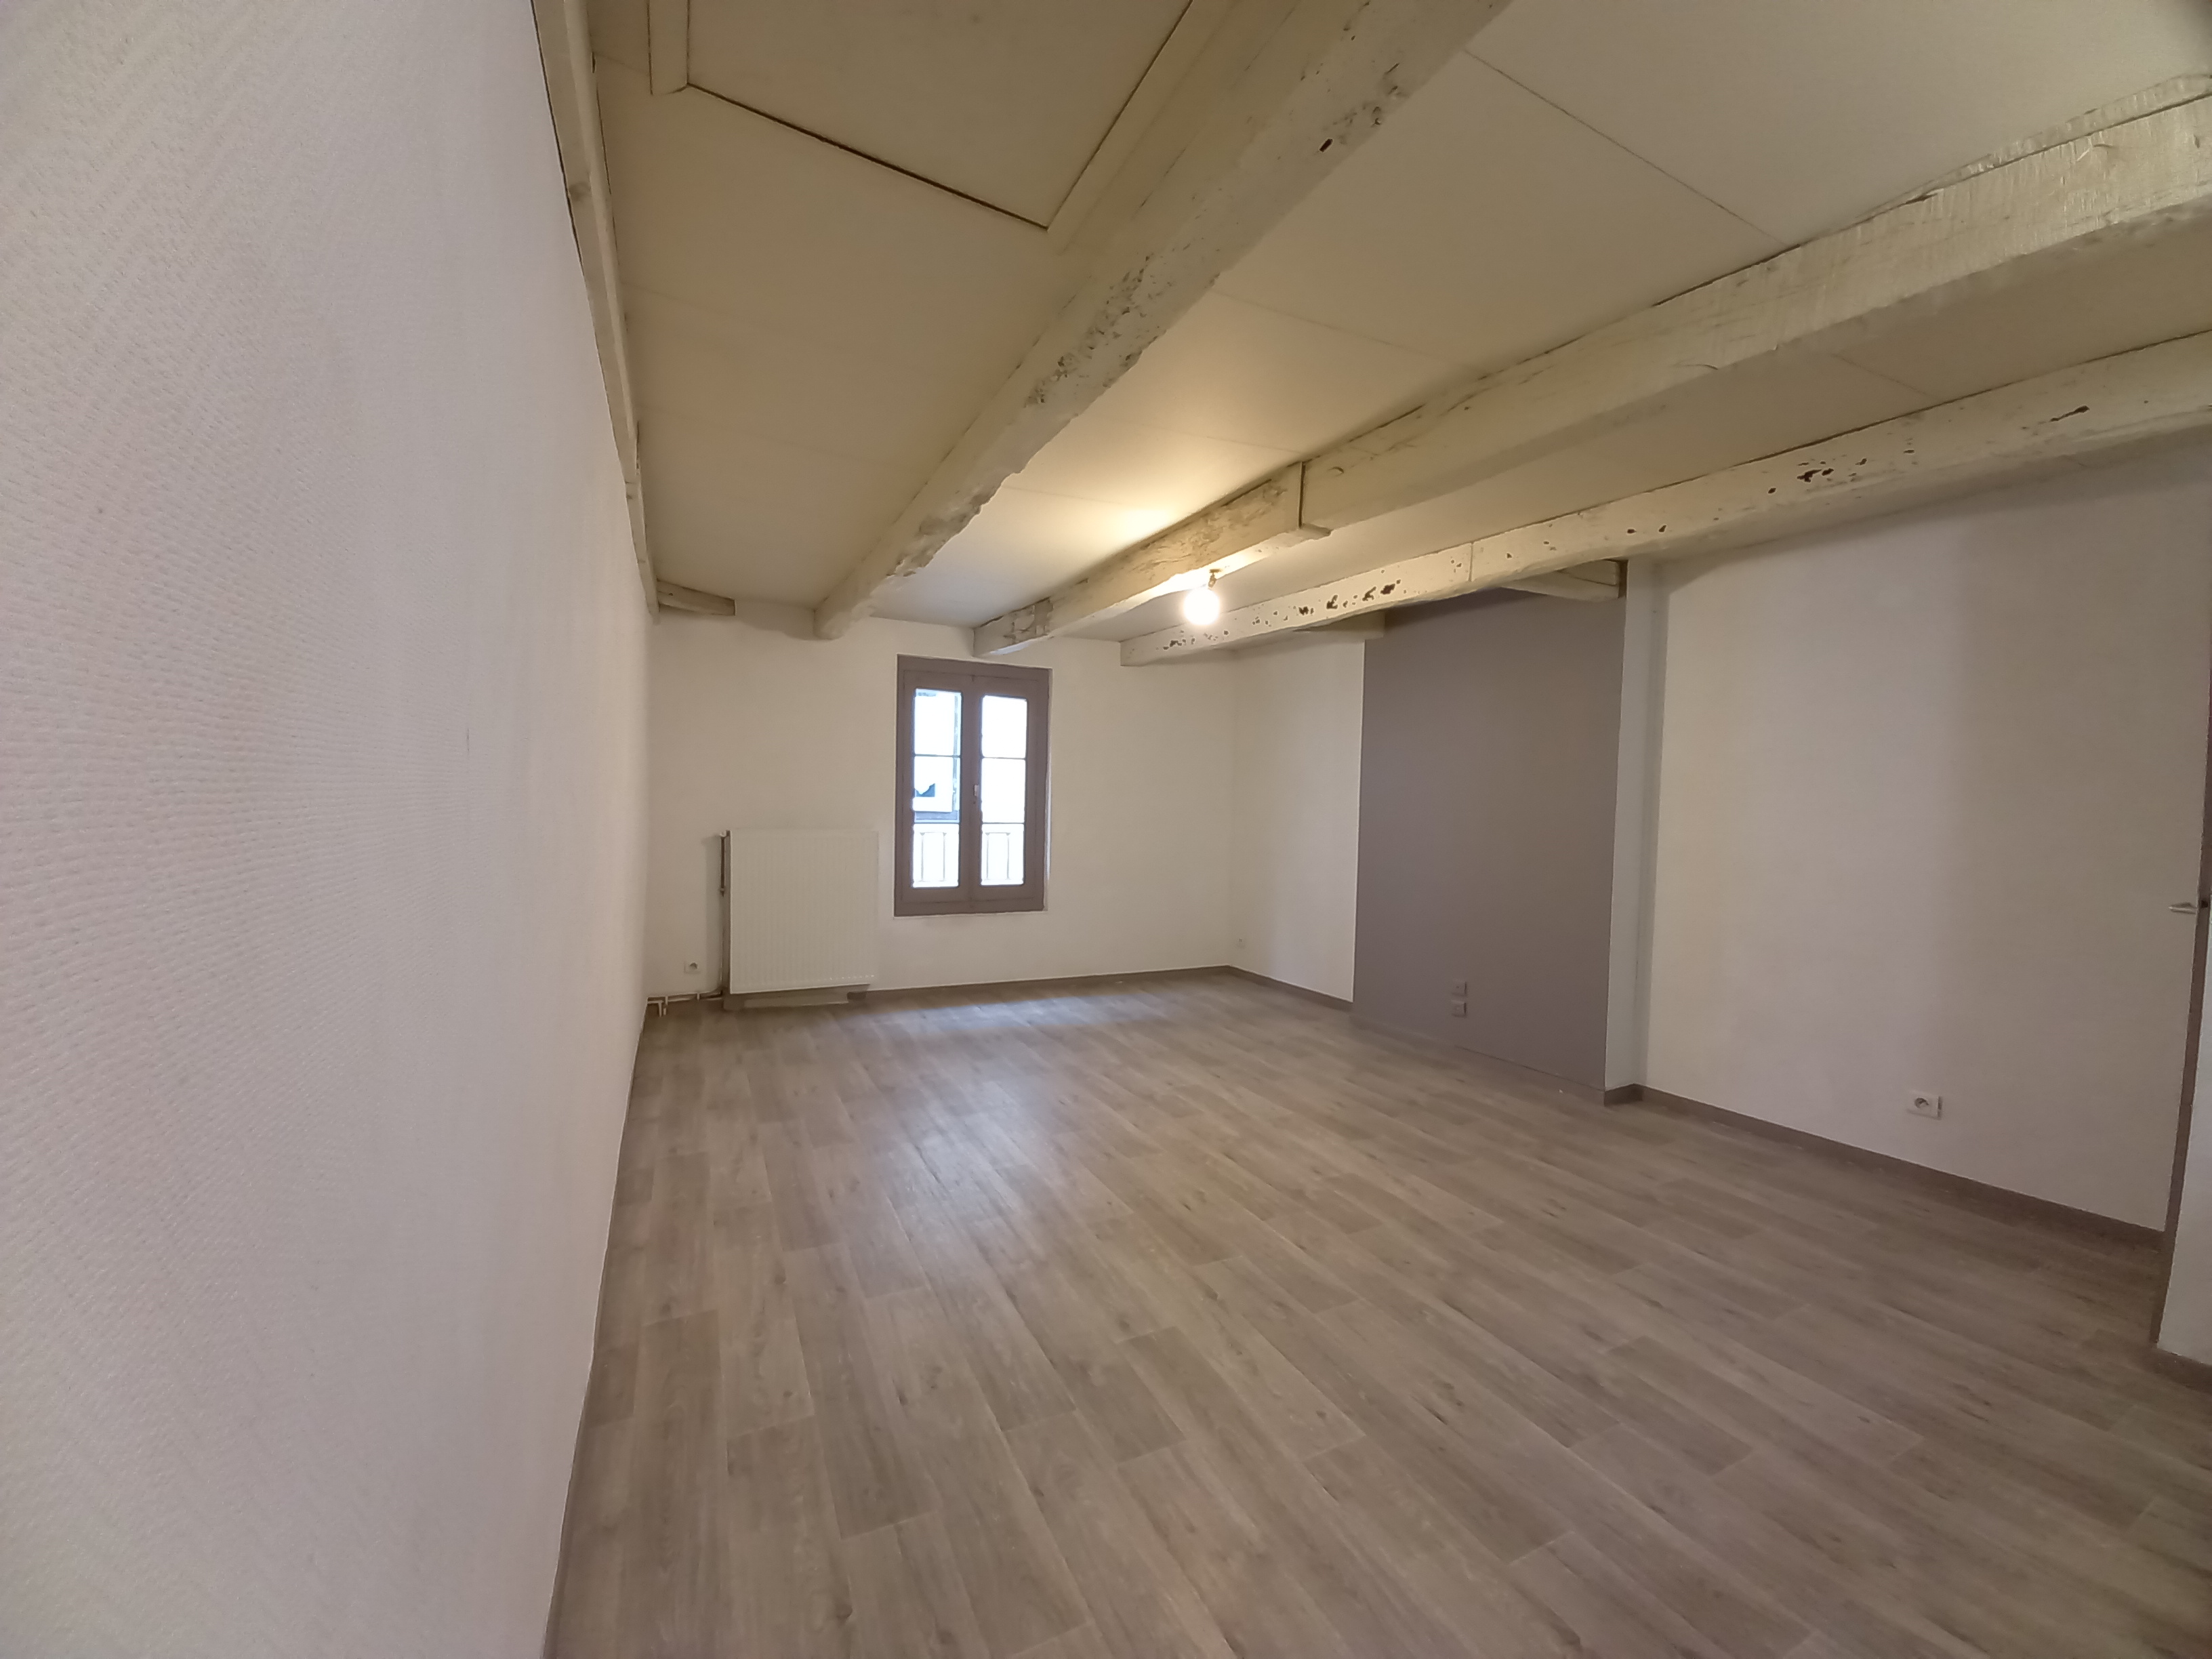 Appartement T4 duplex à louer à FIGEAC CENTRE